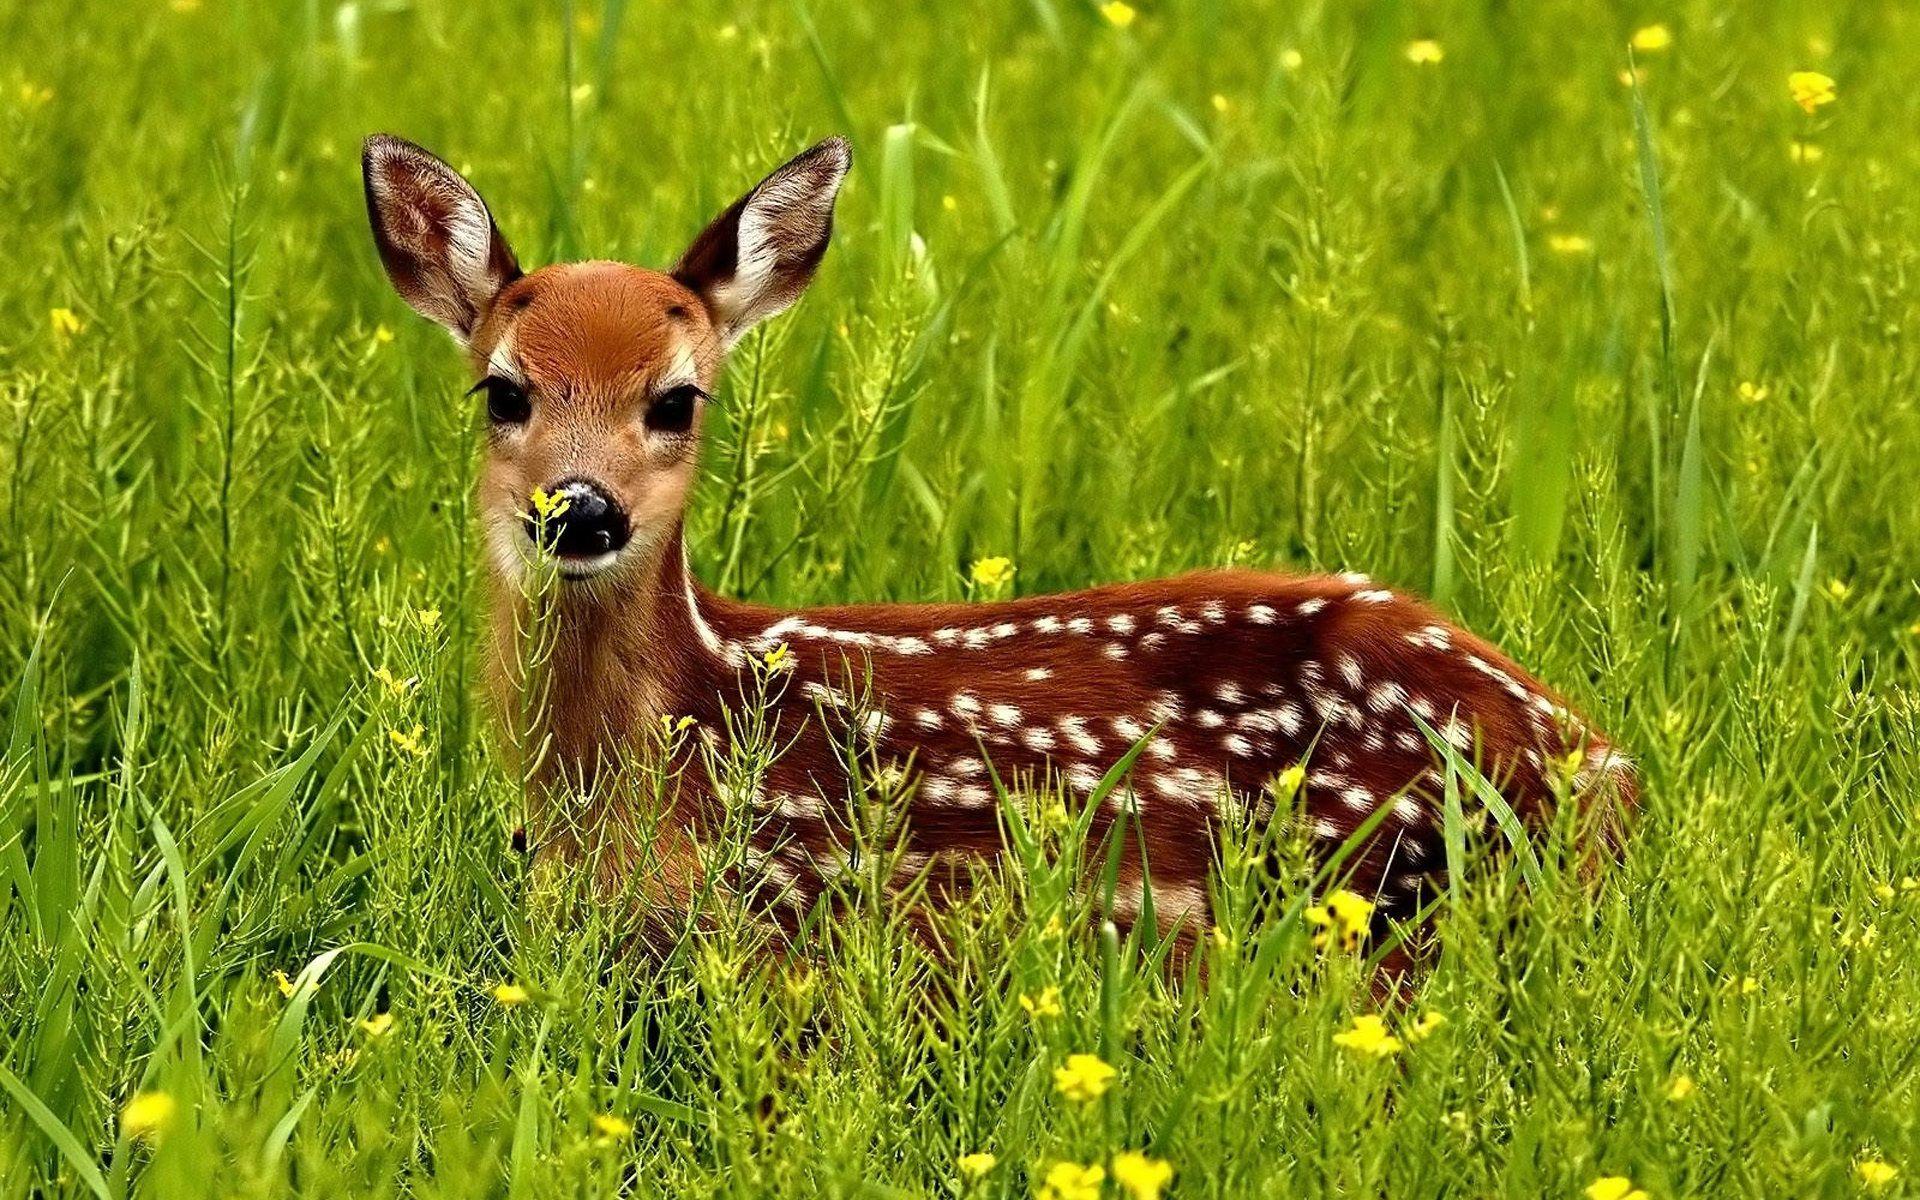 Wildlife Photography Hd Desktop Wallpapers 4k Hd